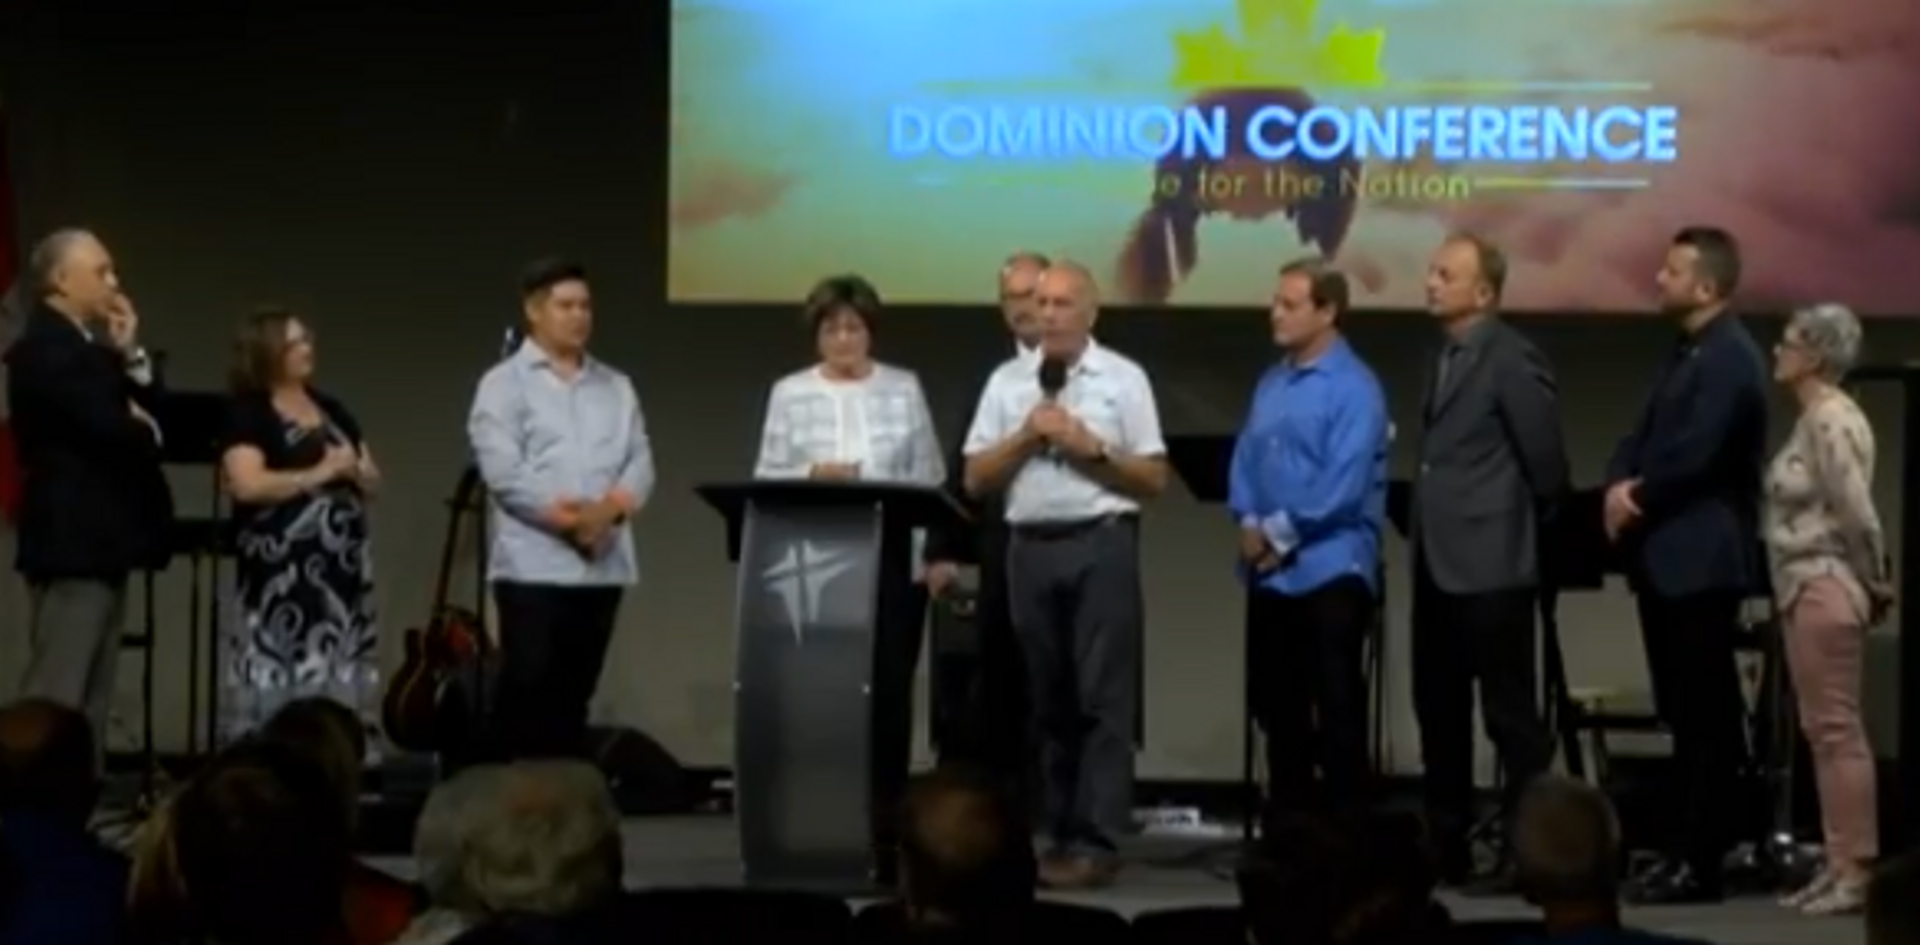 LIFELINE TODAY| Season 4, Episode 107 | Dominion Conference 2017